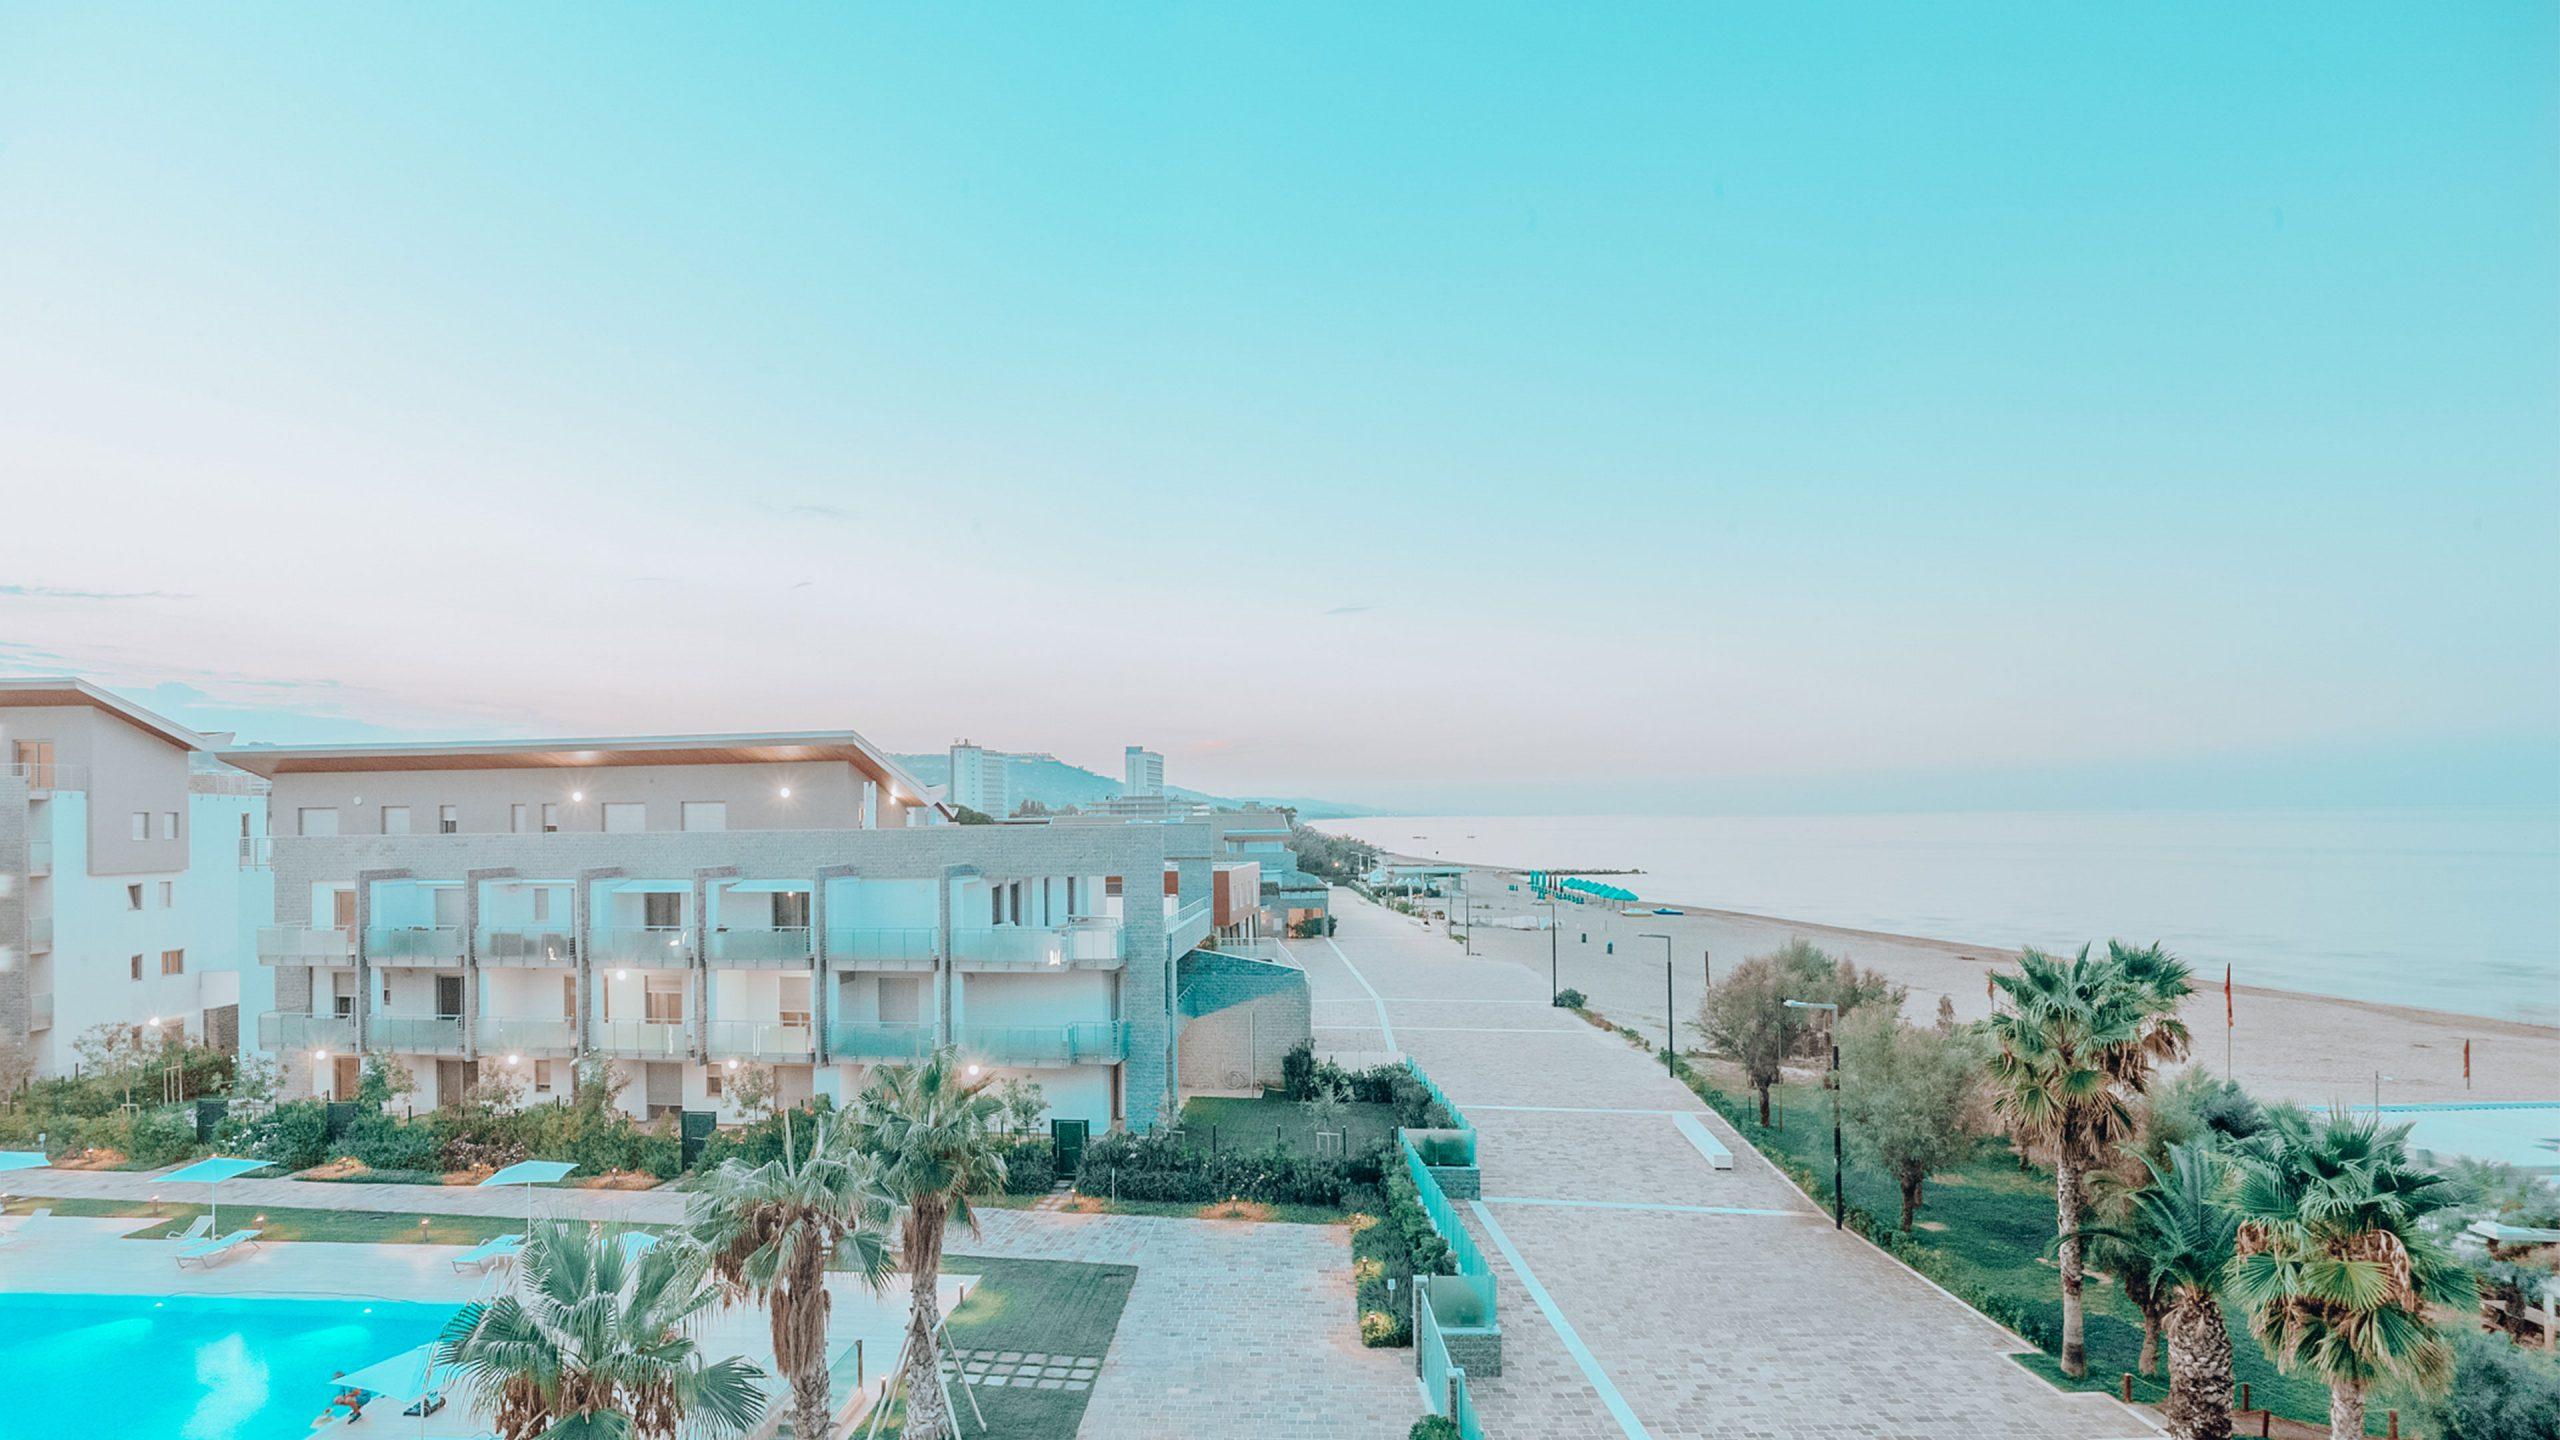 panoramica-aerea-appartamenti-piscina-mare-le-dune-silvi-marina